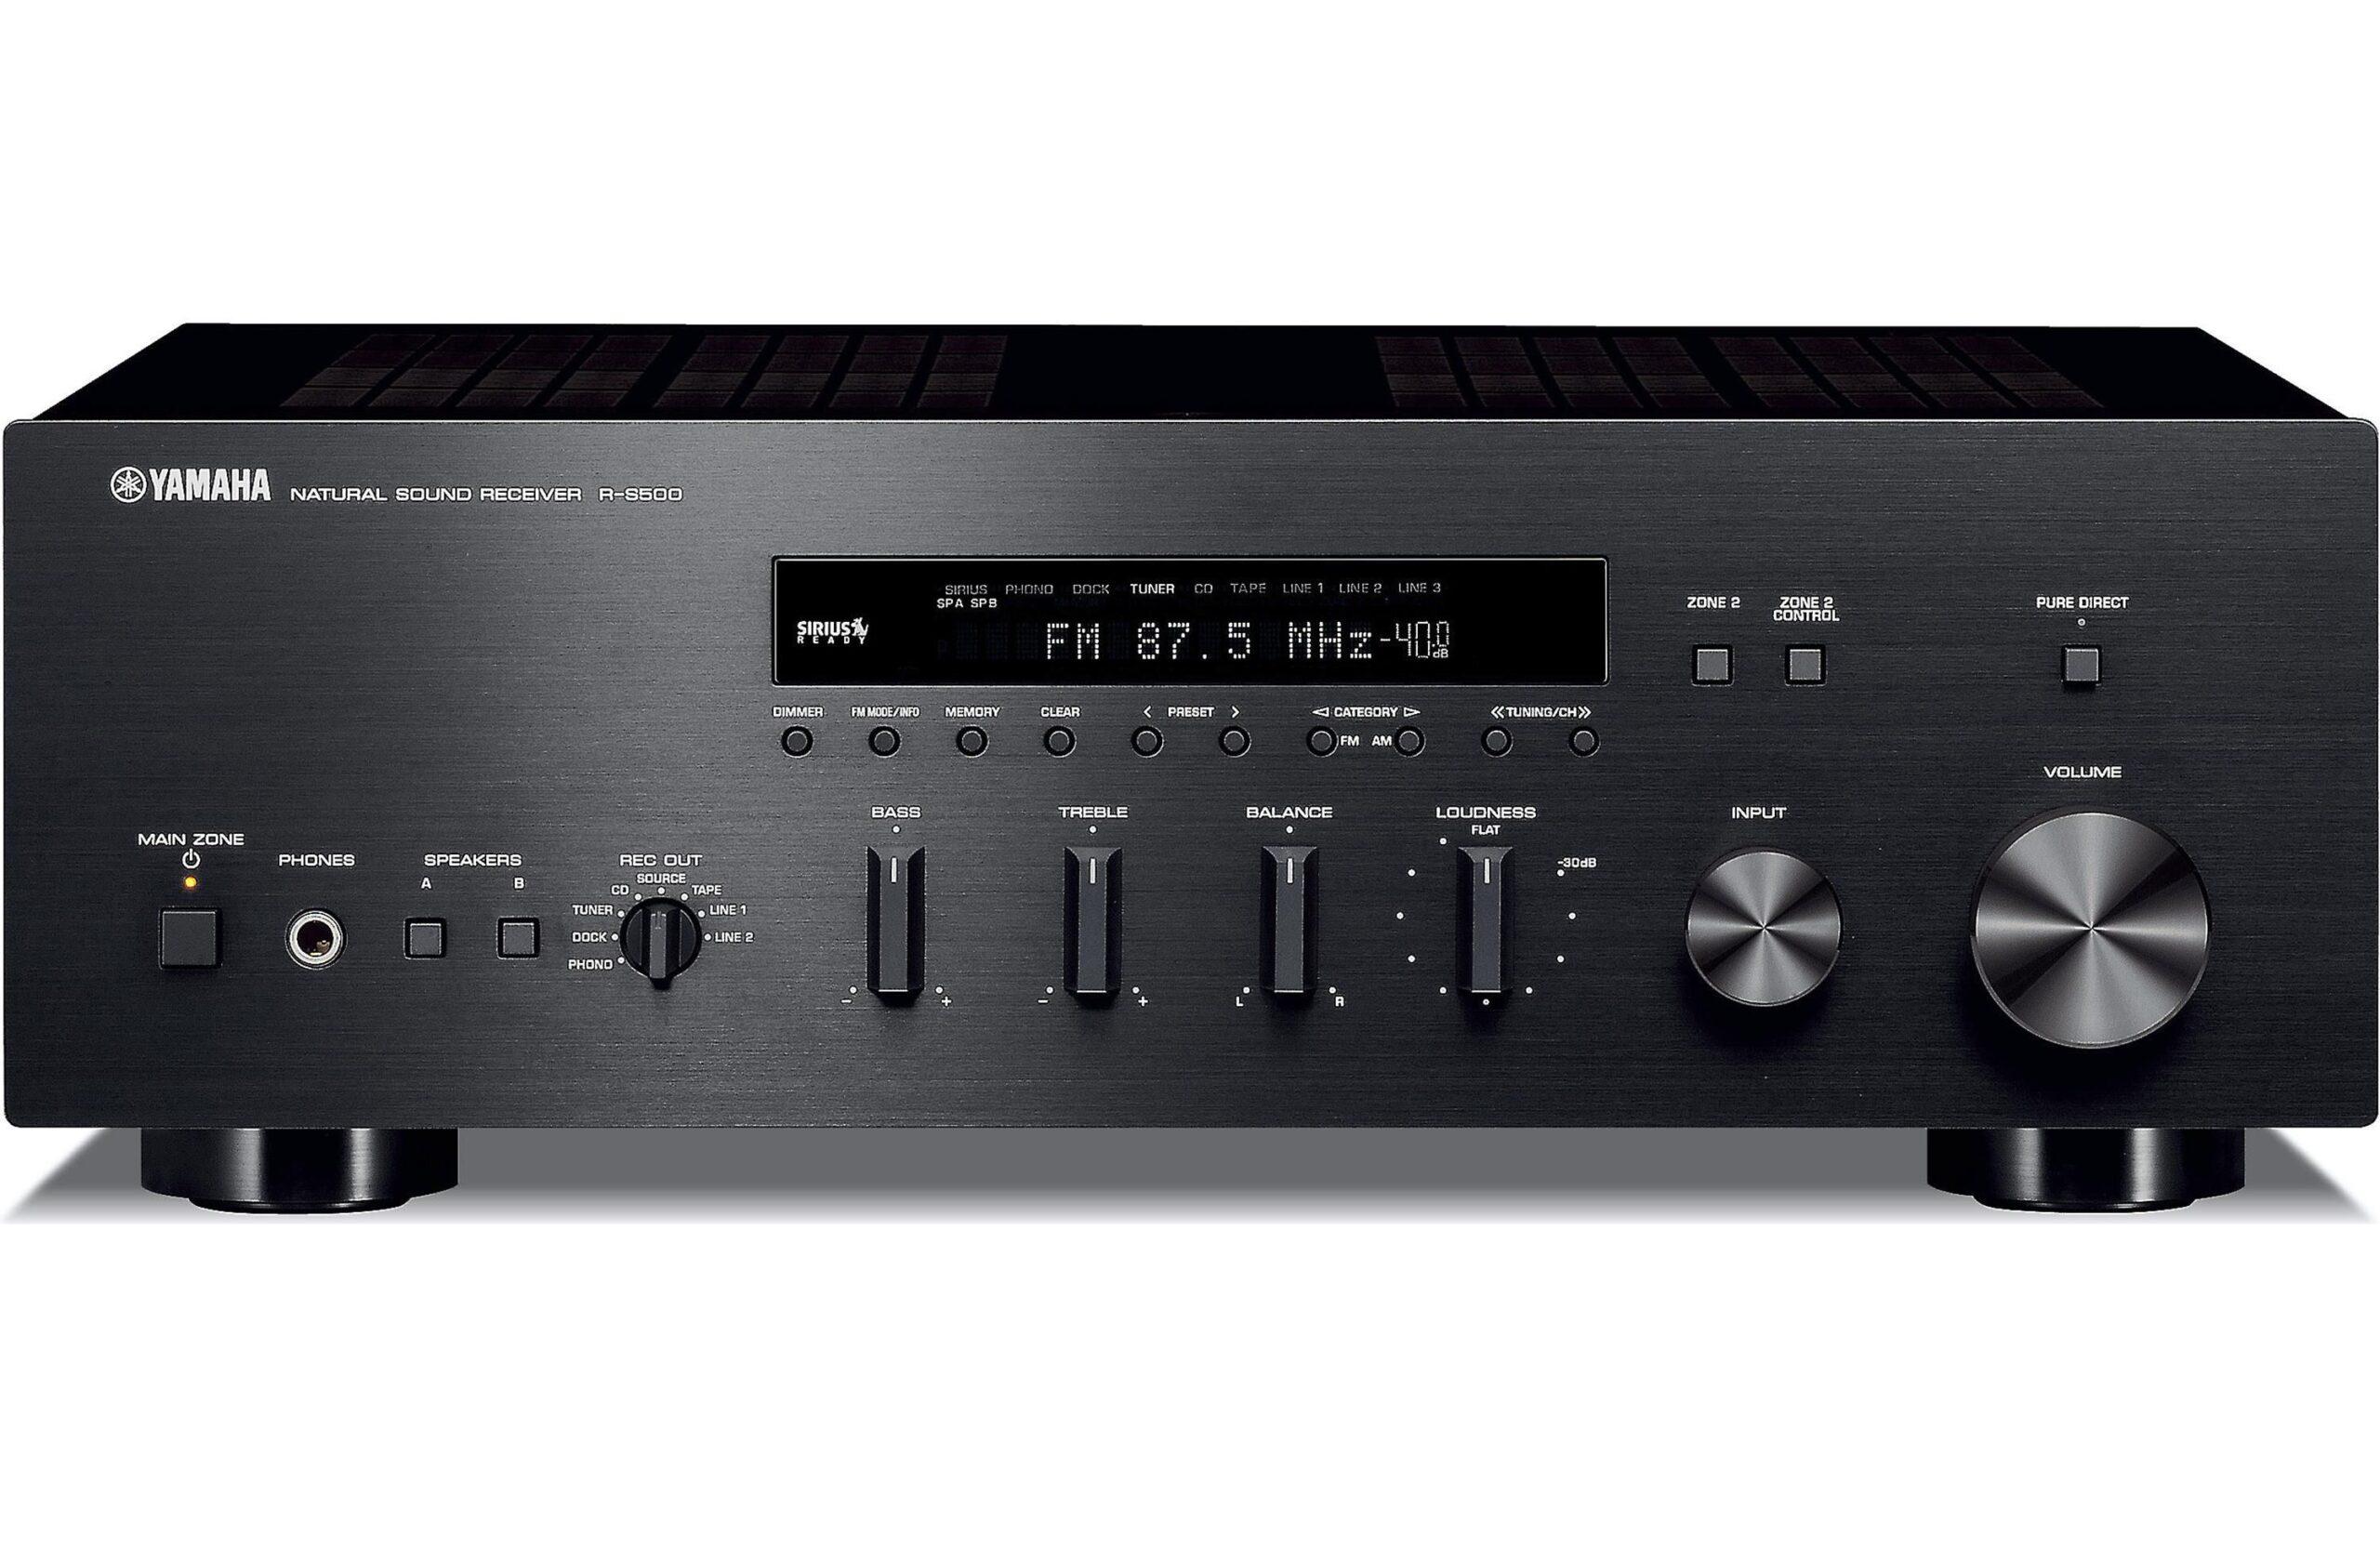 Yamaha-R-S700-ontvanger-recensie